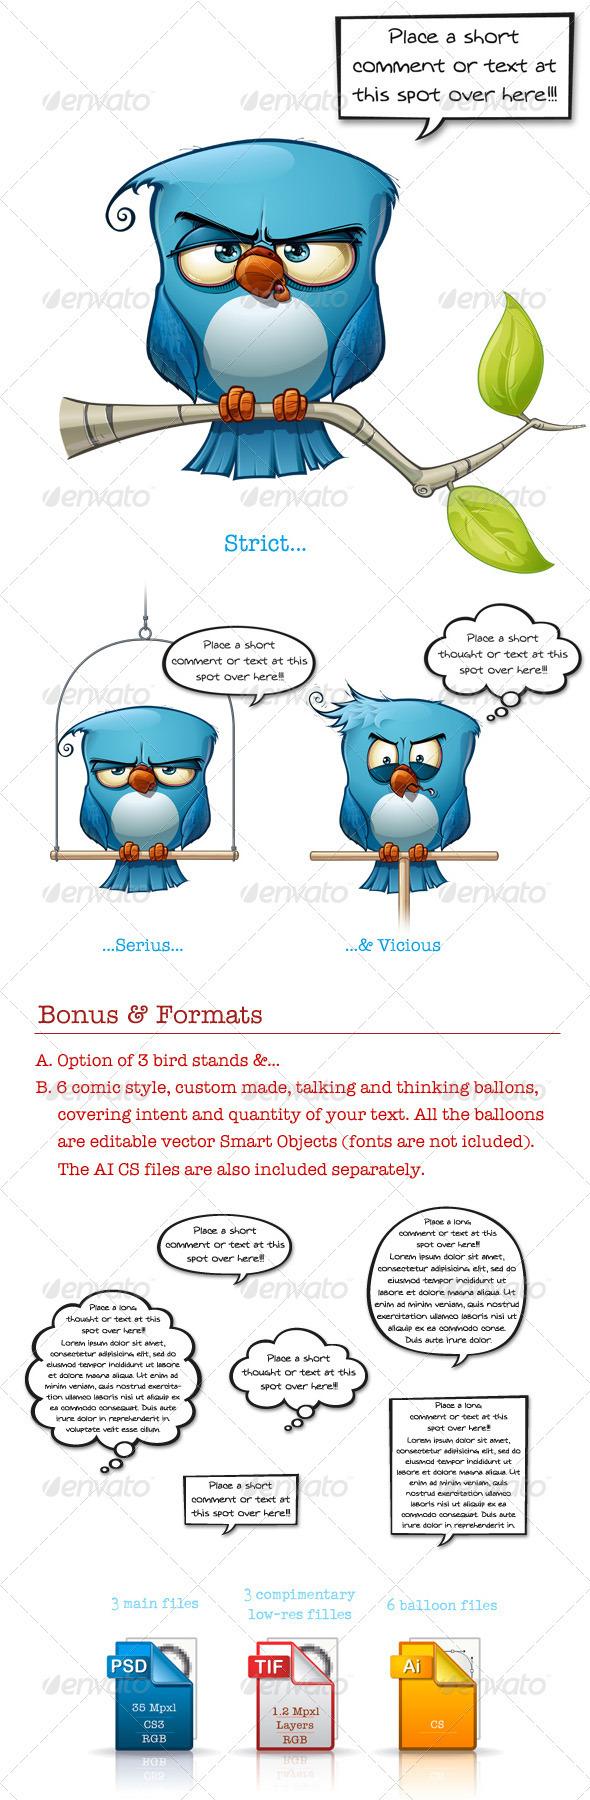 GraphicRiver Blue Bird Strict-Serius-Vicious 3473049